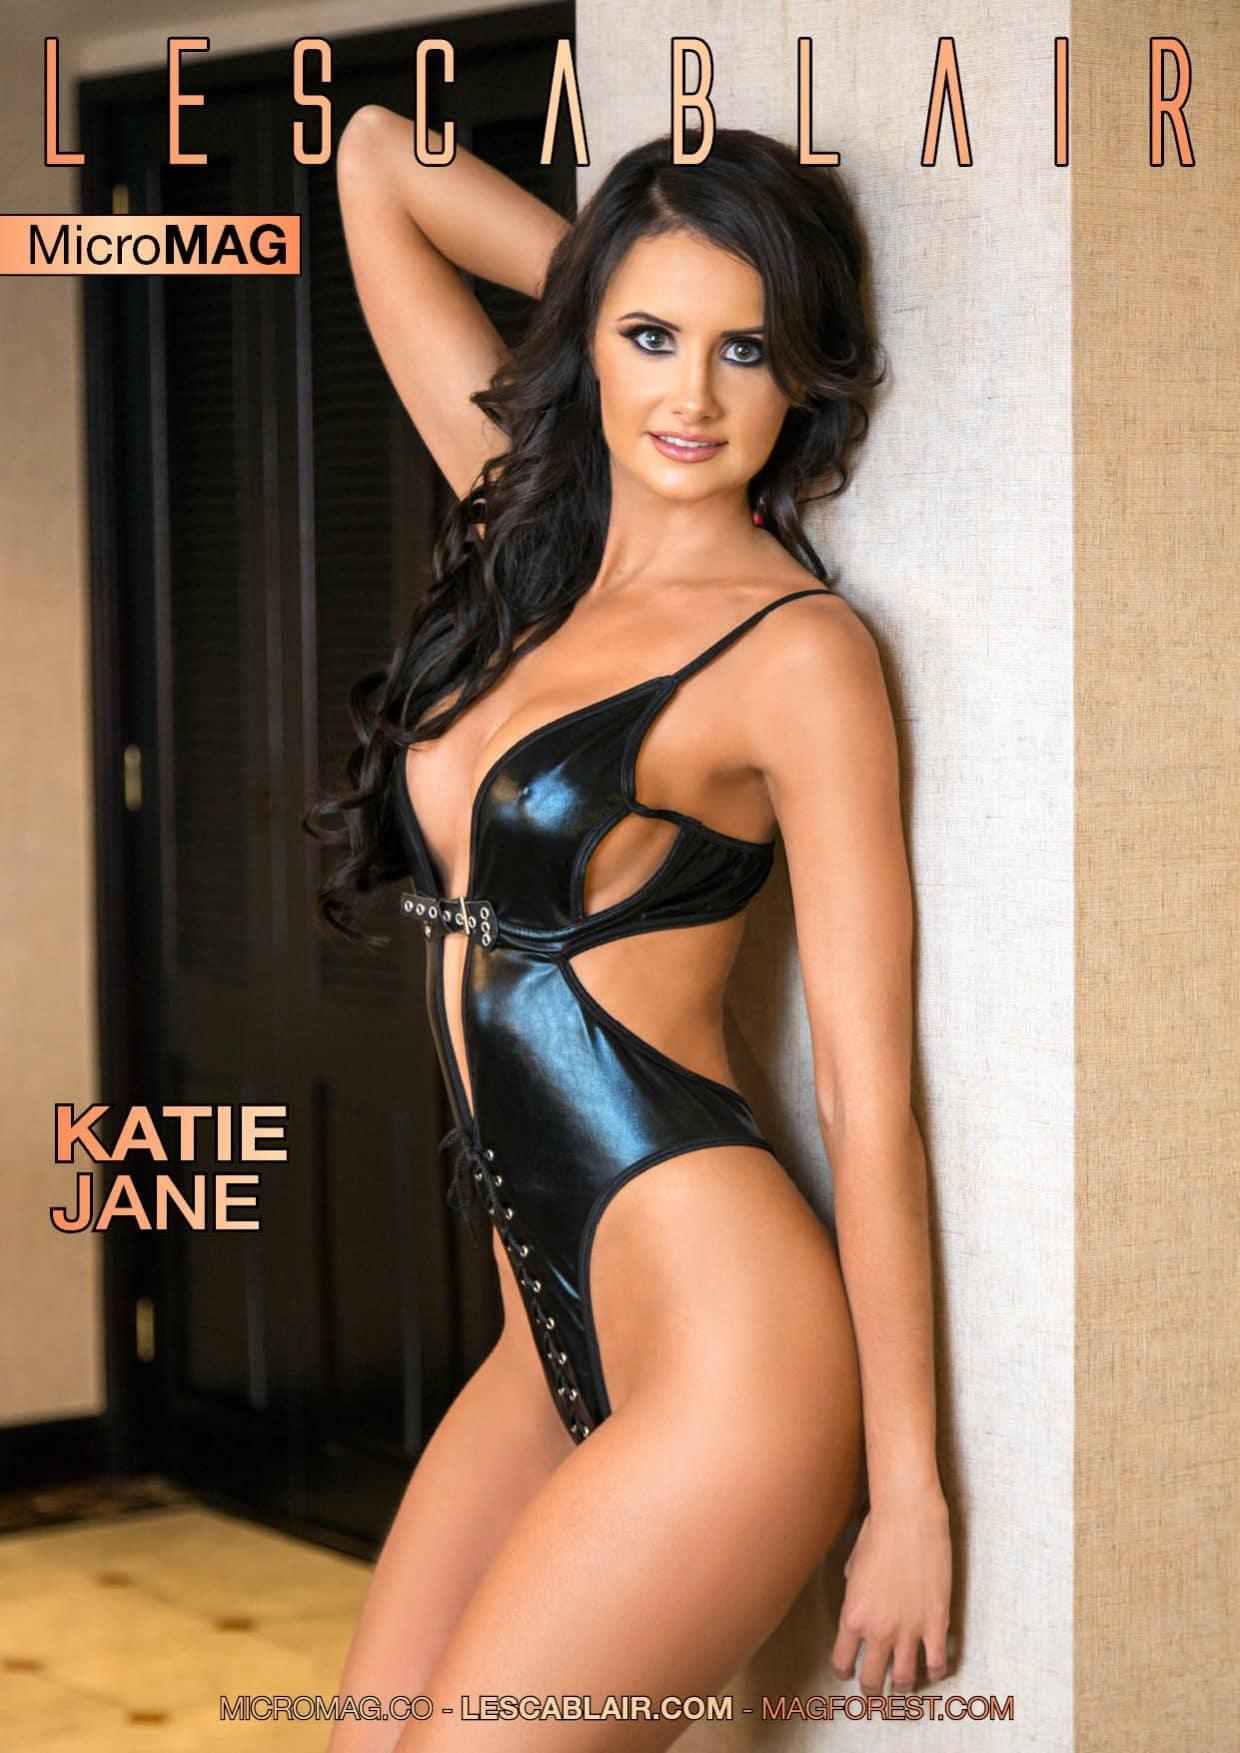 Lescablair MicroMAG - Katie Jane 1